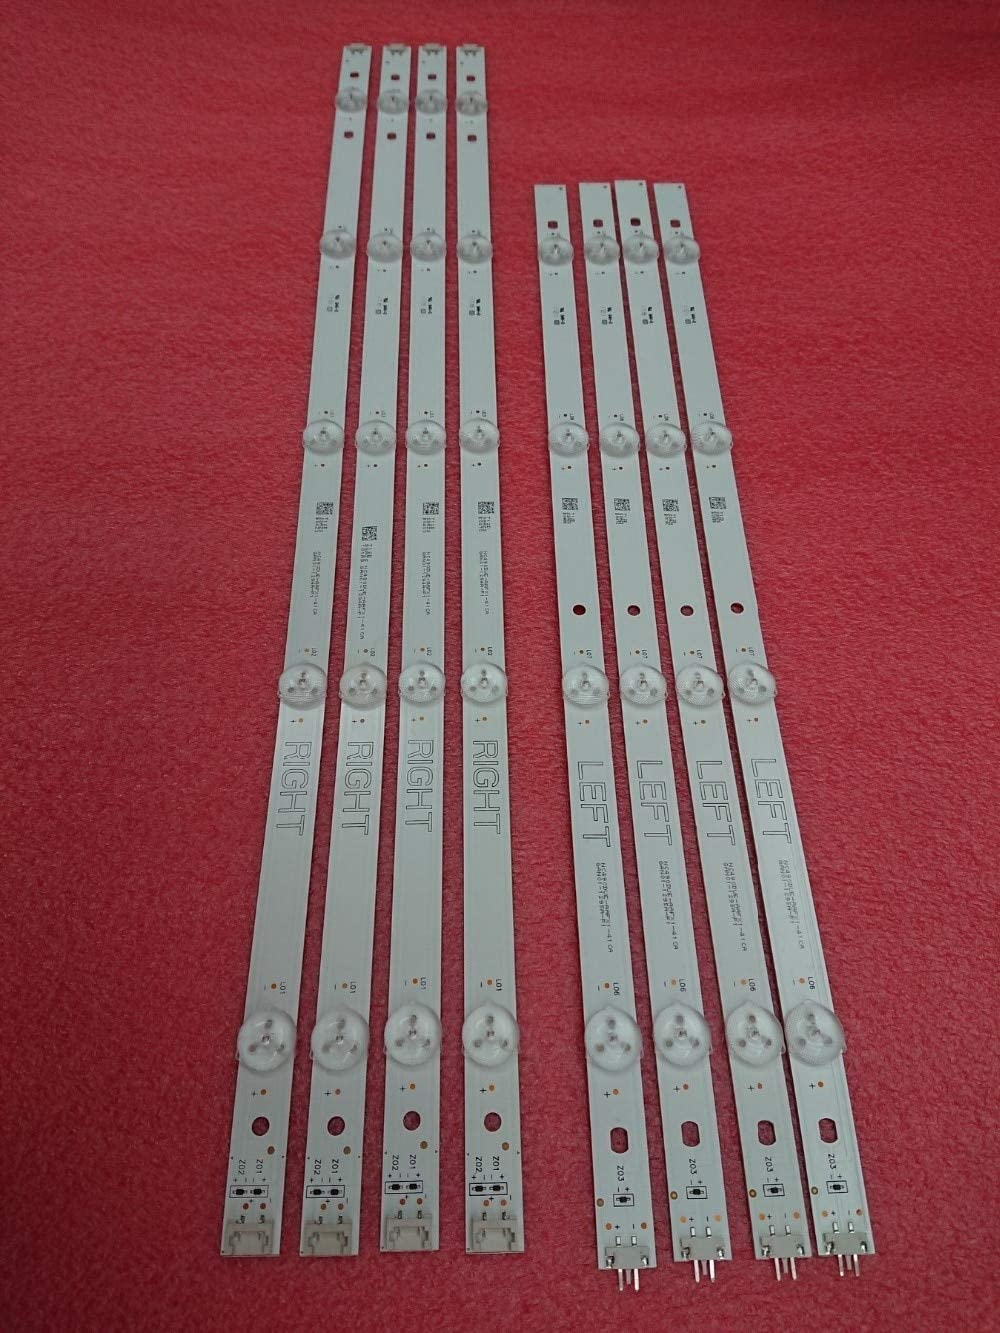 DIPU WULIAN 5set=40 PCS LED backlight strip for LG TV 49UJ630V 49LJ5500 NC490DUE-AAFX1-41CA GAN01-1294A-P1 GAN01-1295A-P1: Amazon.es: Iluminación